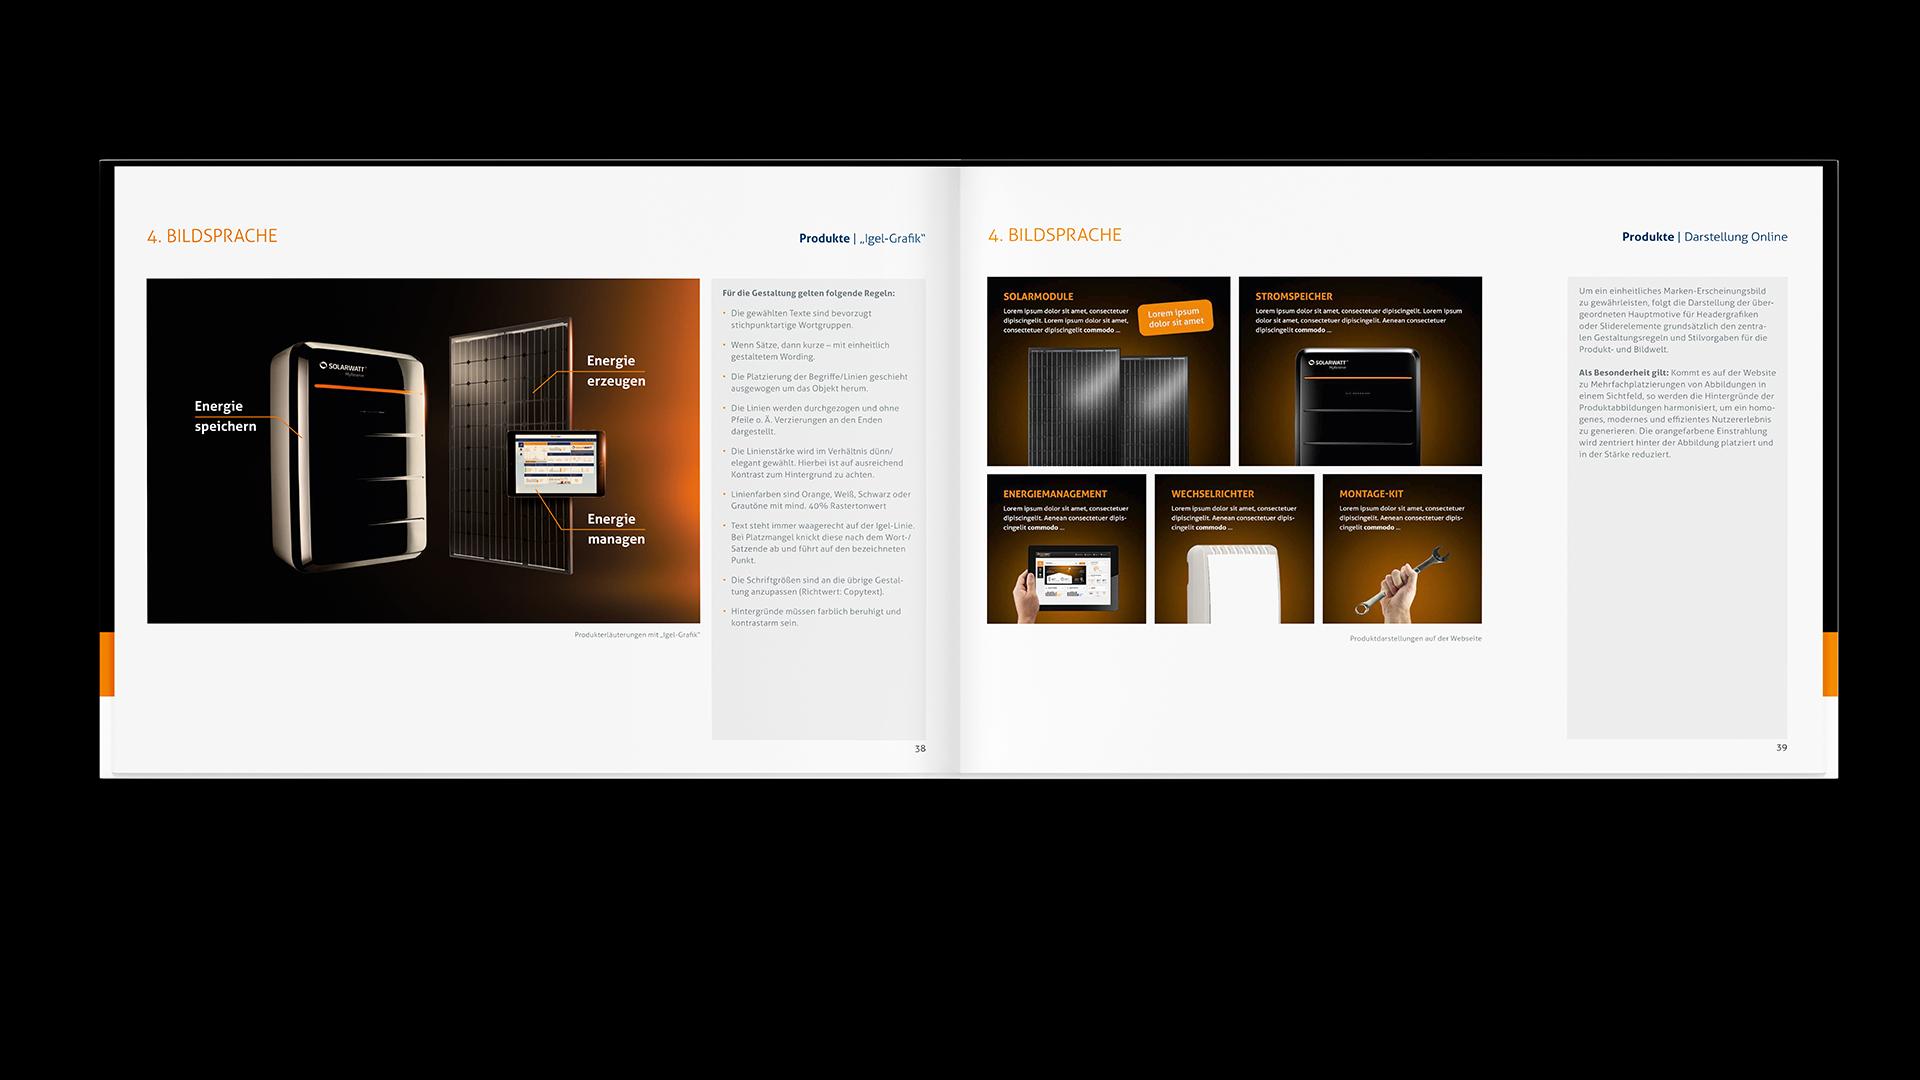 solarwatt_content_handbuch3